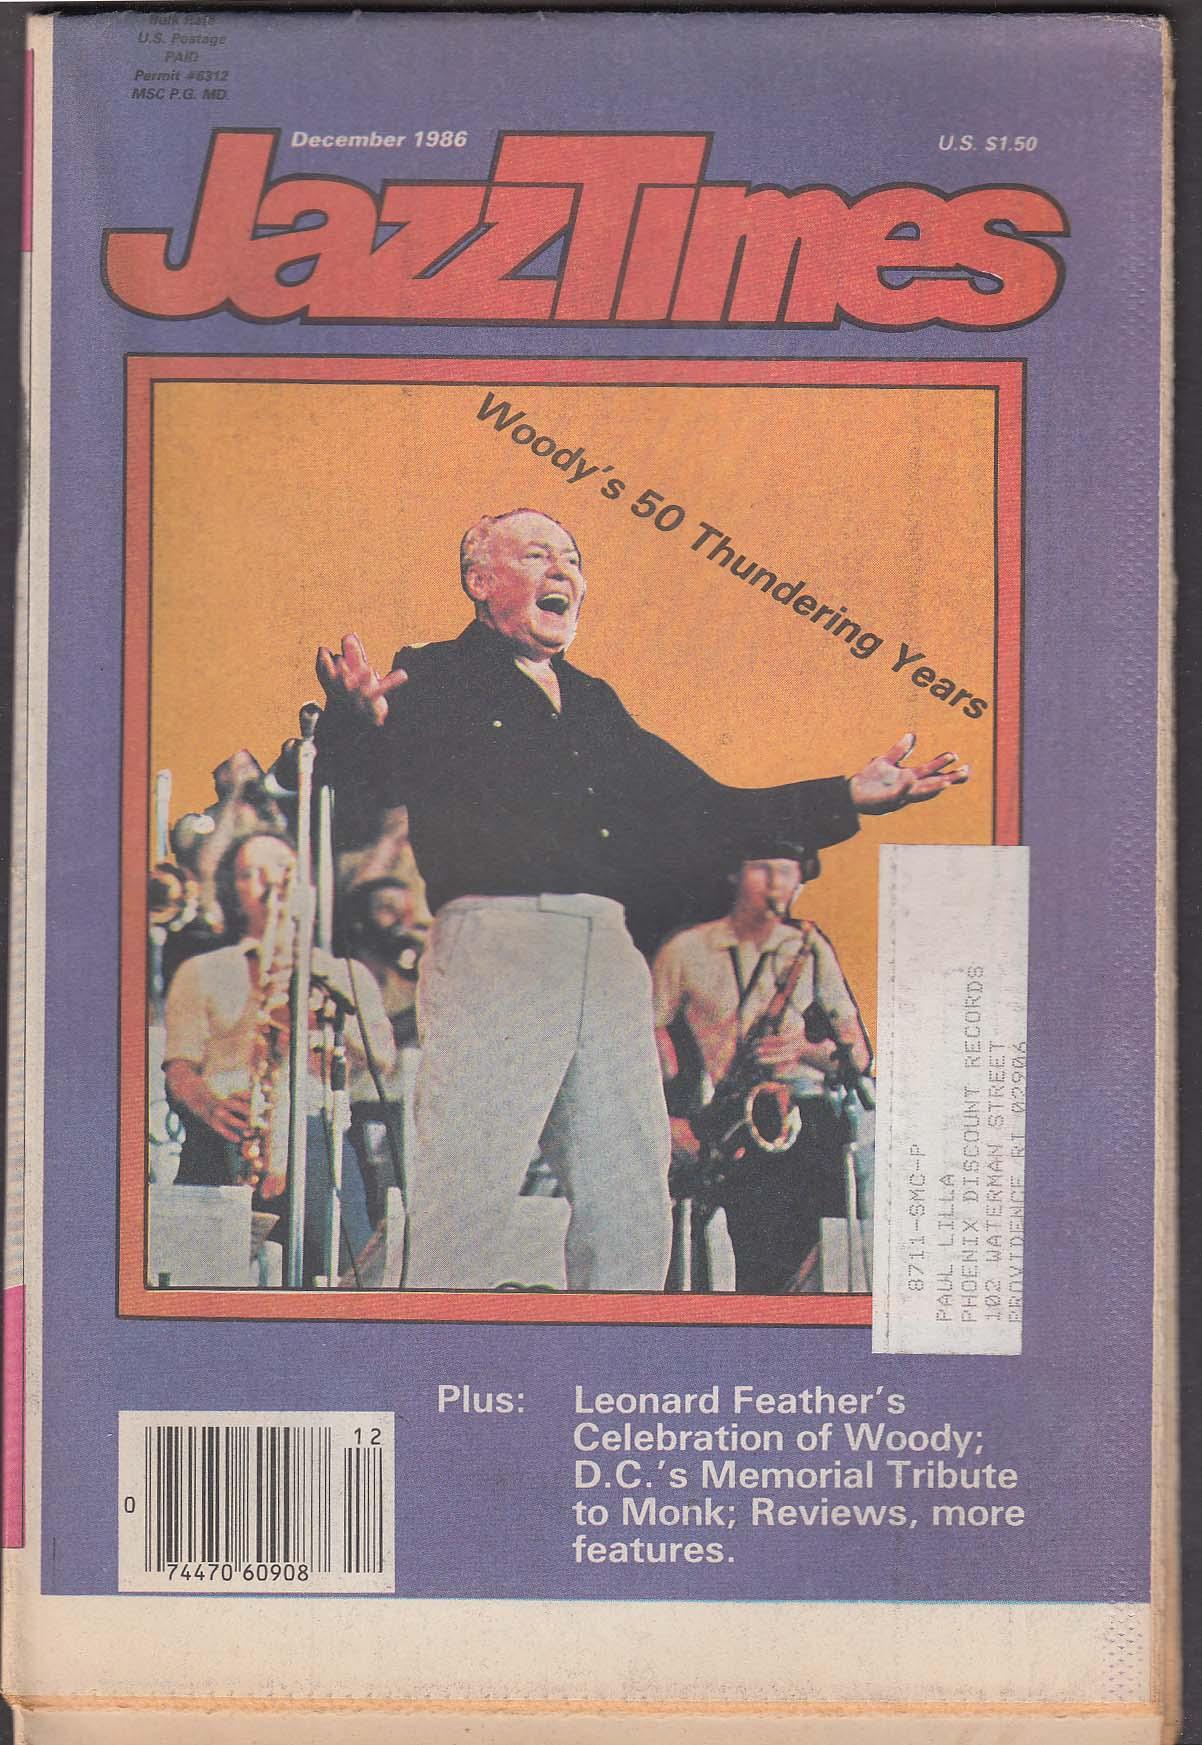 JAZZTIMES Woody Herman Thelonious Monk ++ 12 1986